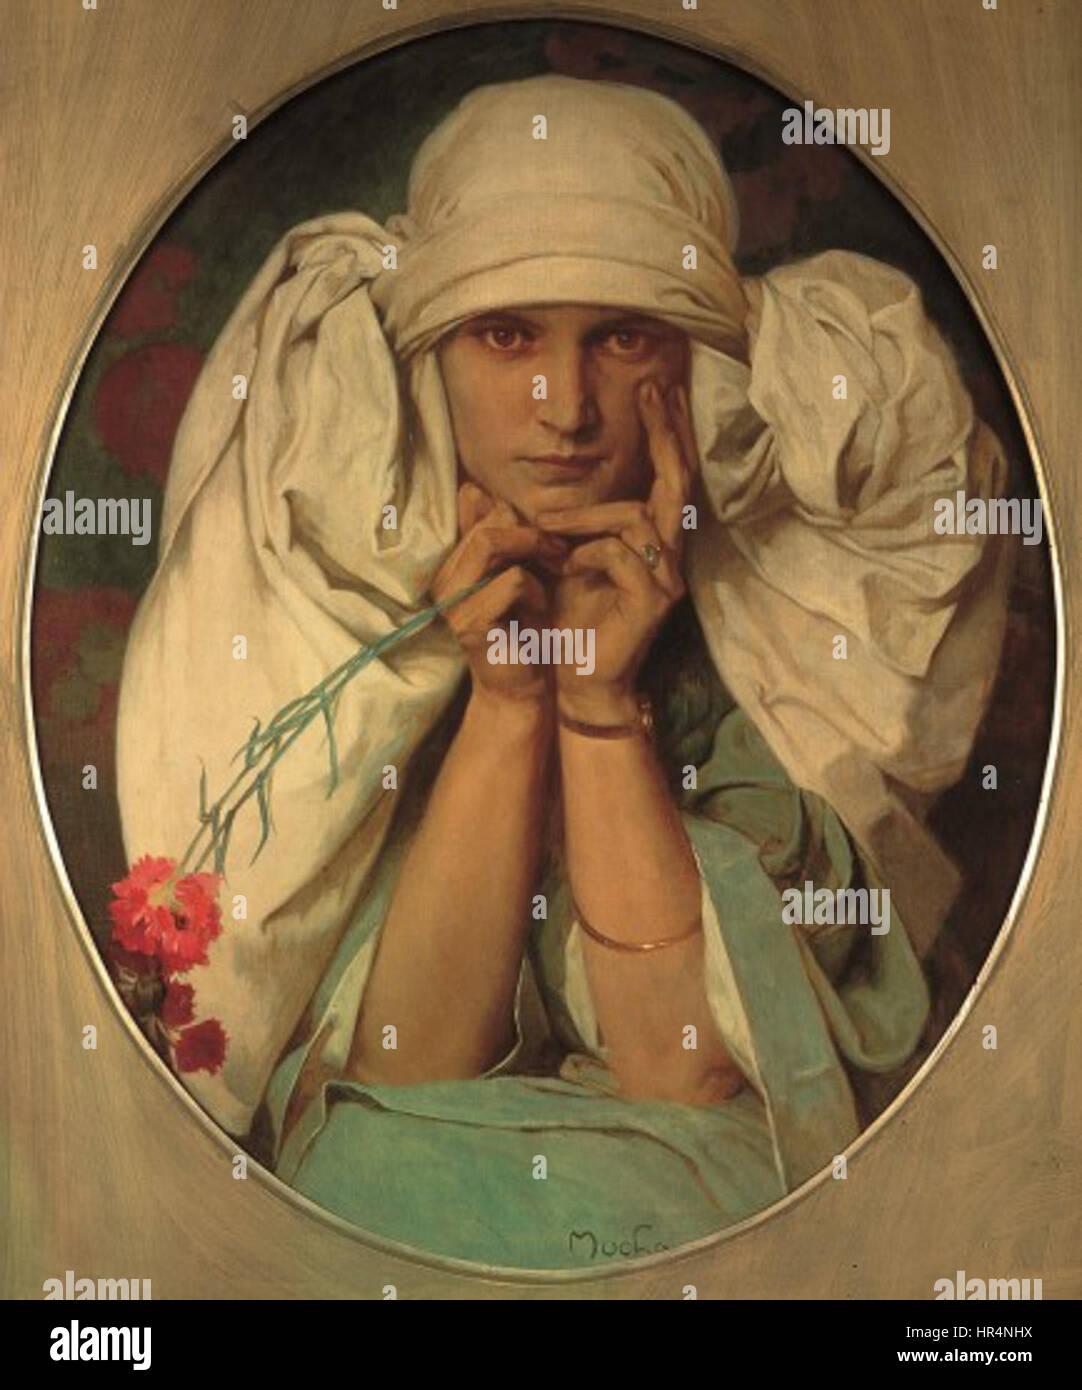 Portrait of Mucha's Daughter, Jaroslava - Alfons Mucha - Stock Image